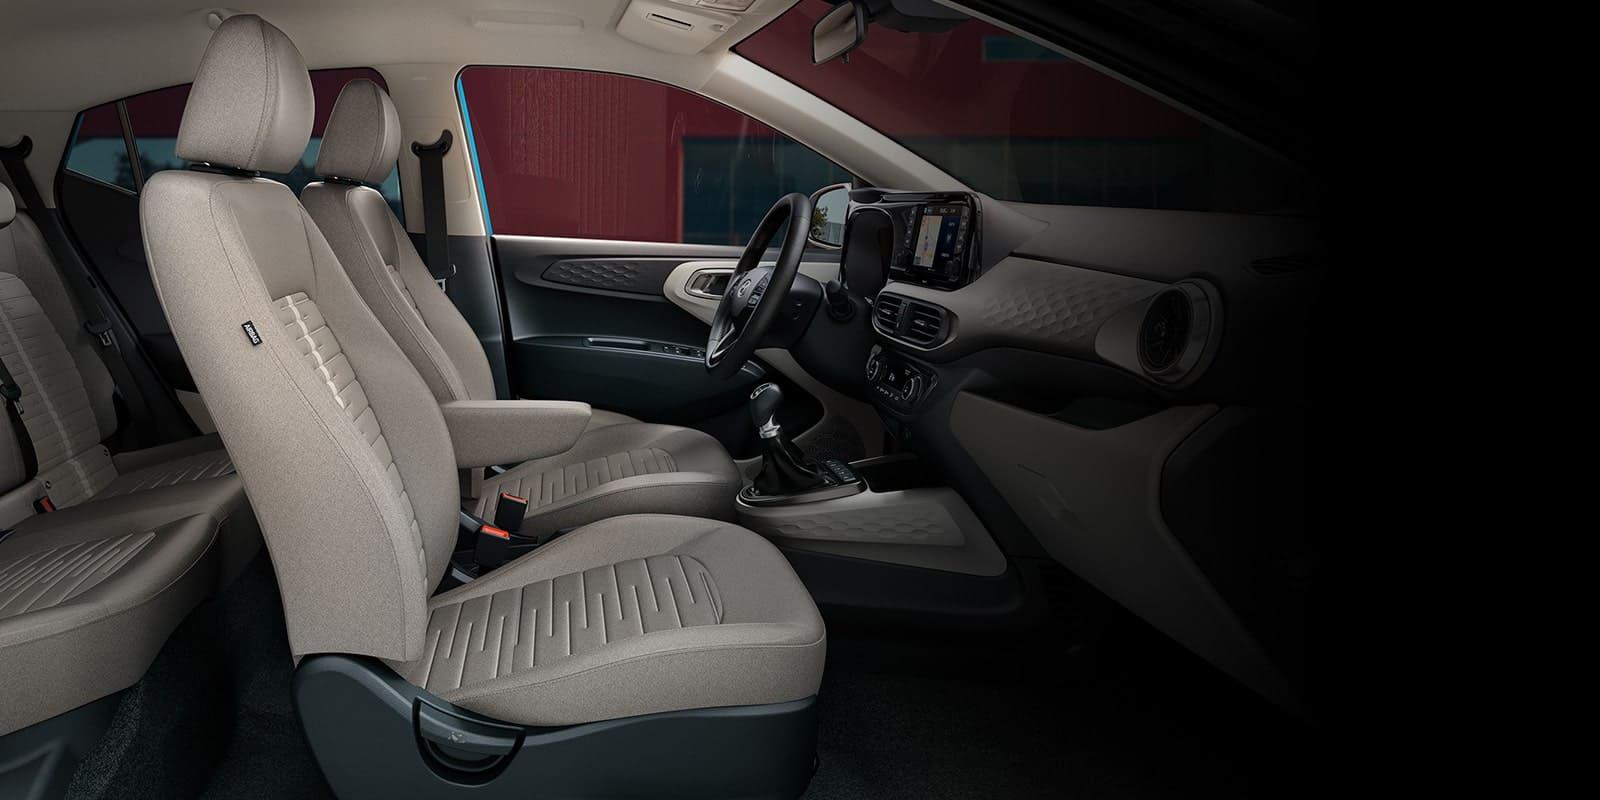 La nouvelle Hyundai i10